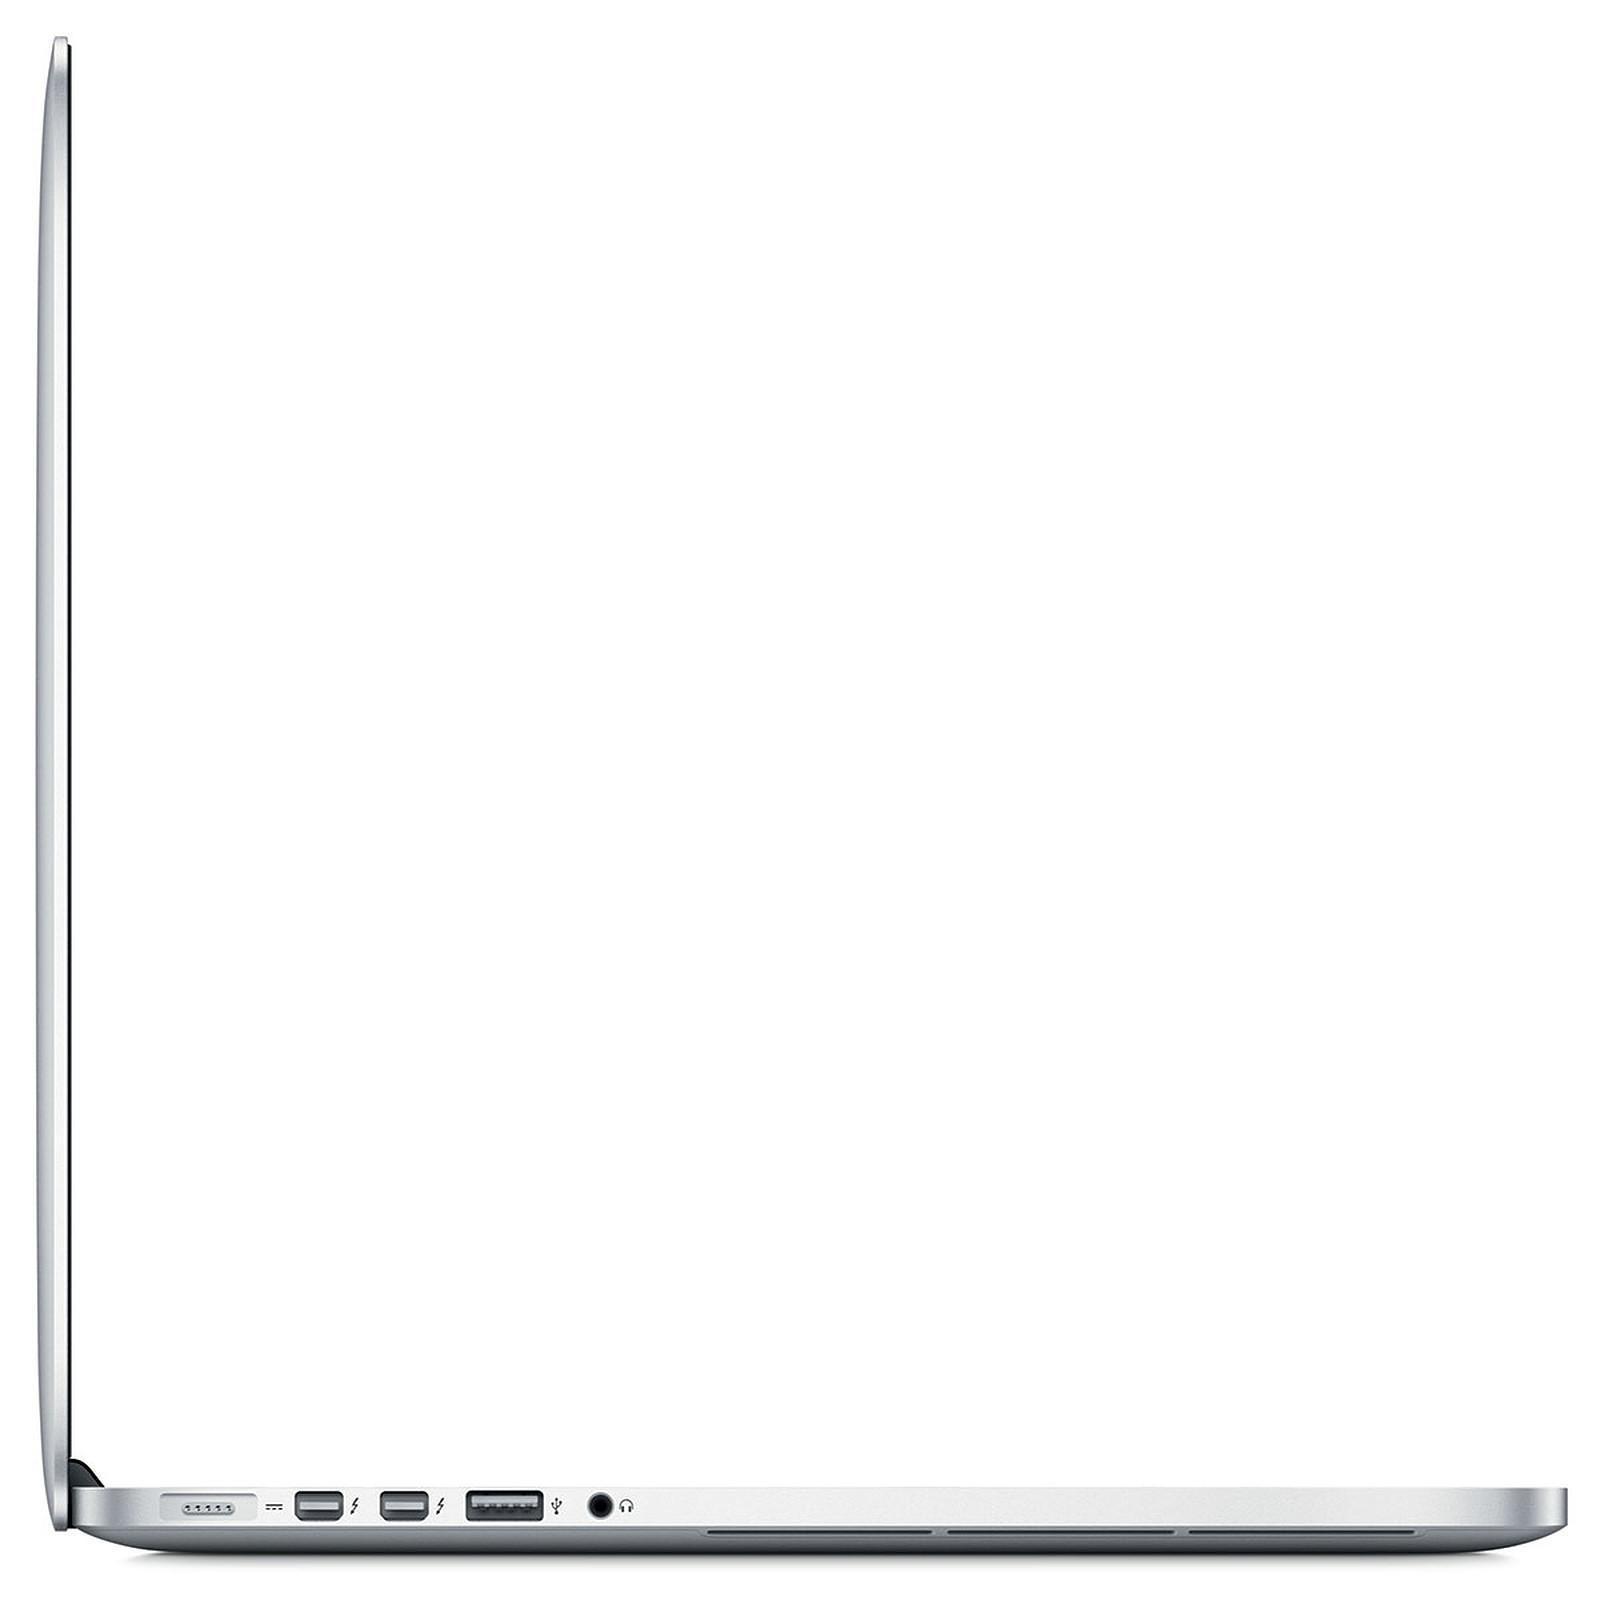 MacBook Pro Retina 15.4-inch (2015) - Core i7 - 16GB - SSD 512 GB